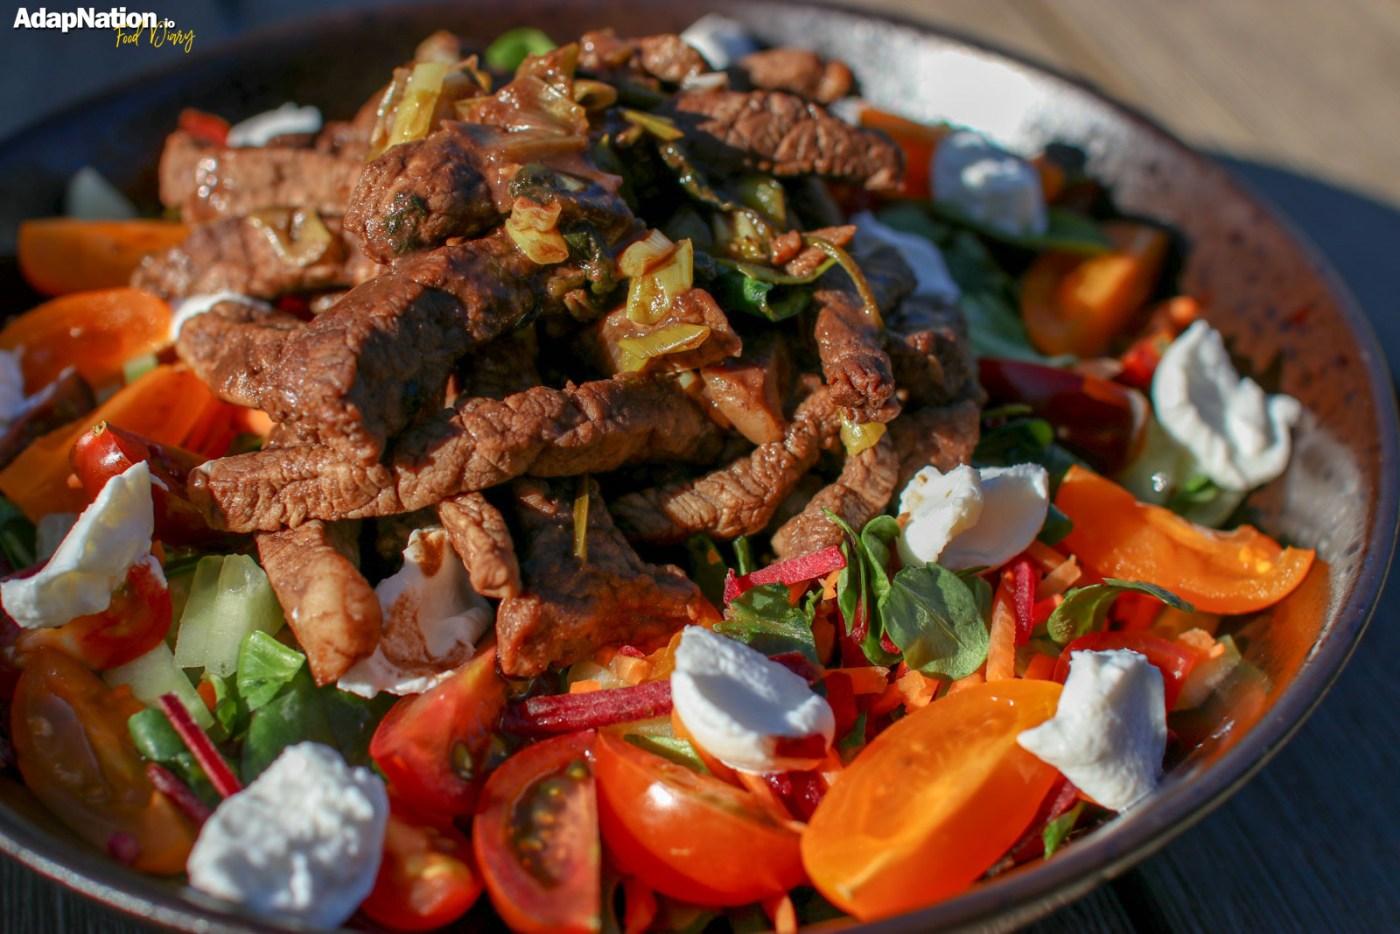 Balsamic Beef & Goats Cheese Tomato Salad